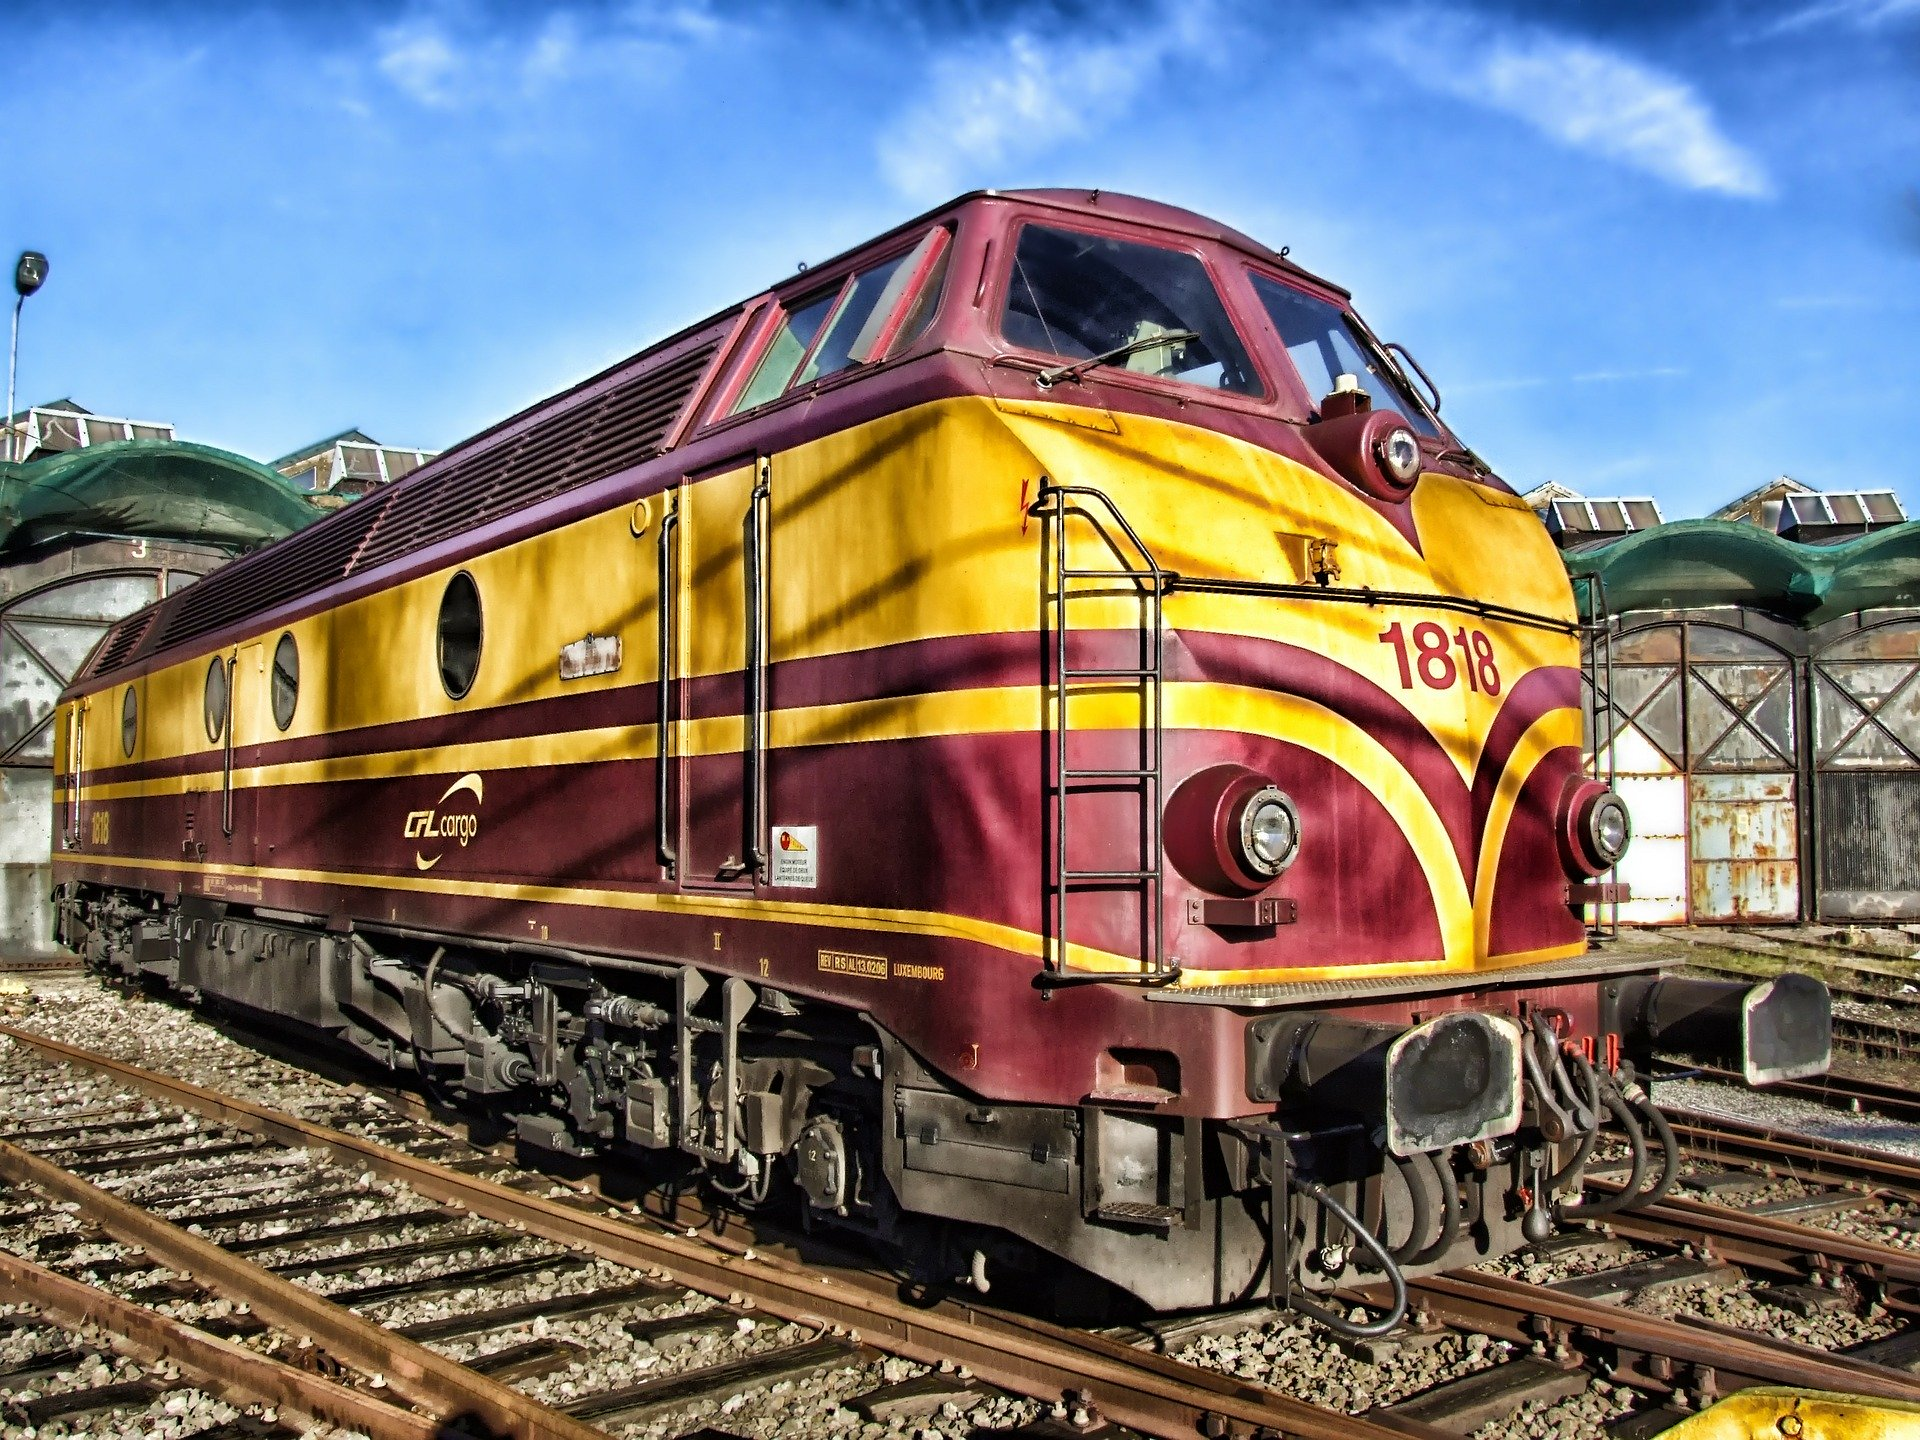 train-143847_1920